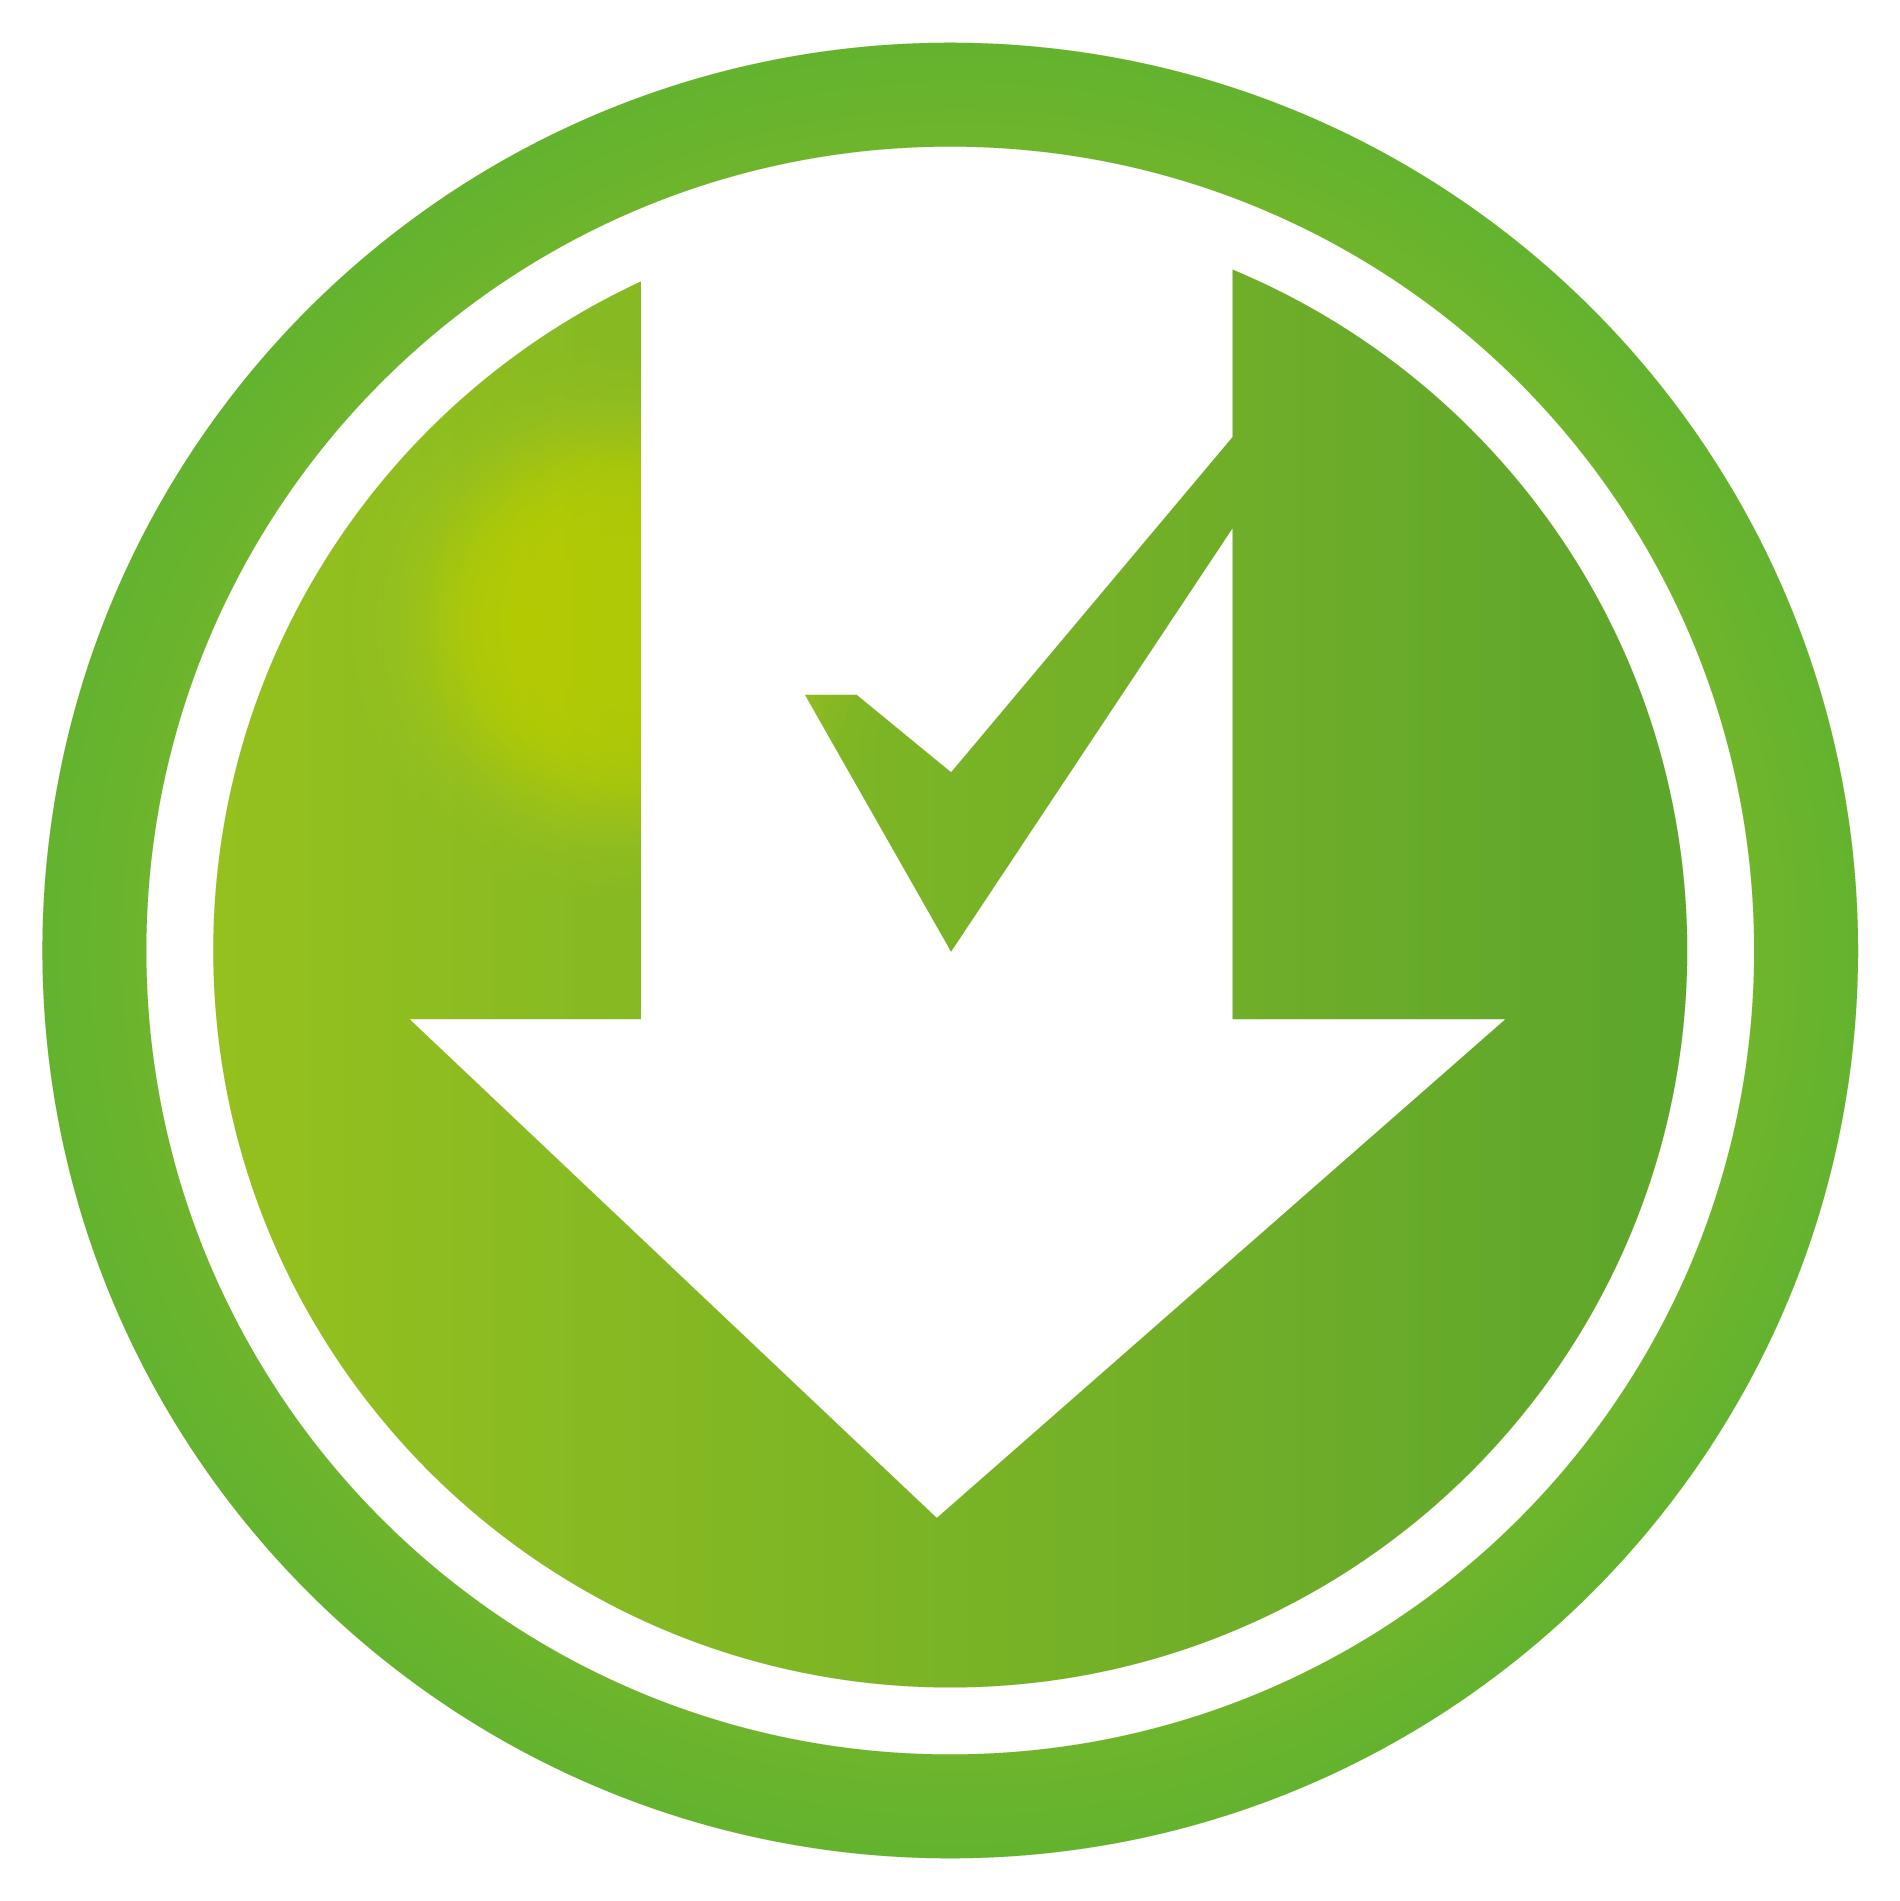 https://fordfuels.co.uk/wp-content/uploads/Compatible-Icon-350x350.png+https://fordfuels.co.uk/wp-content/uploads/Compatible-Icon-700x700.png